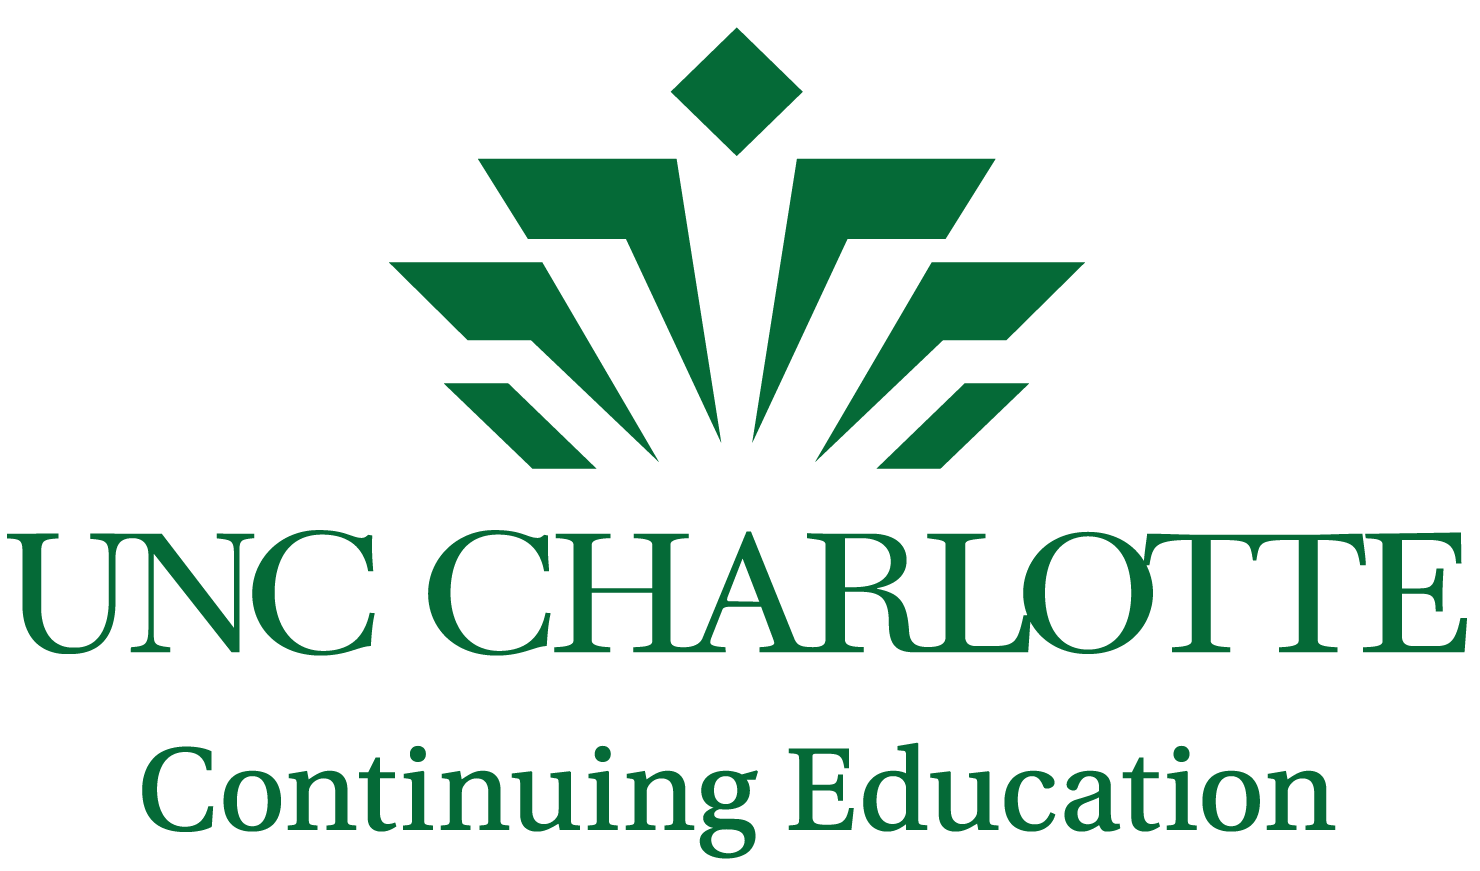 University of North Carolina Charlotte Continuing Education